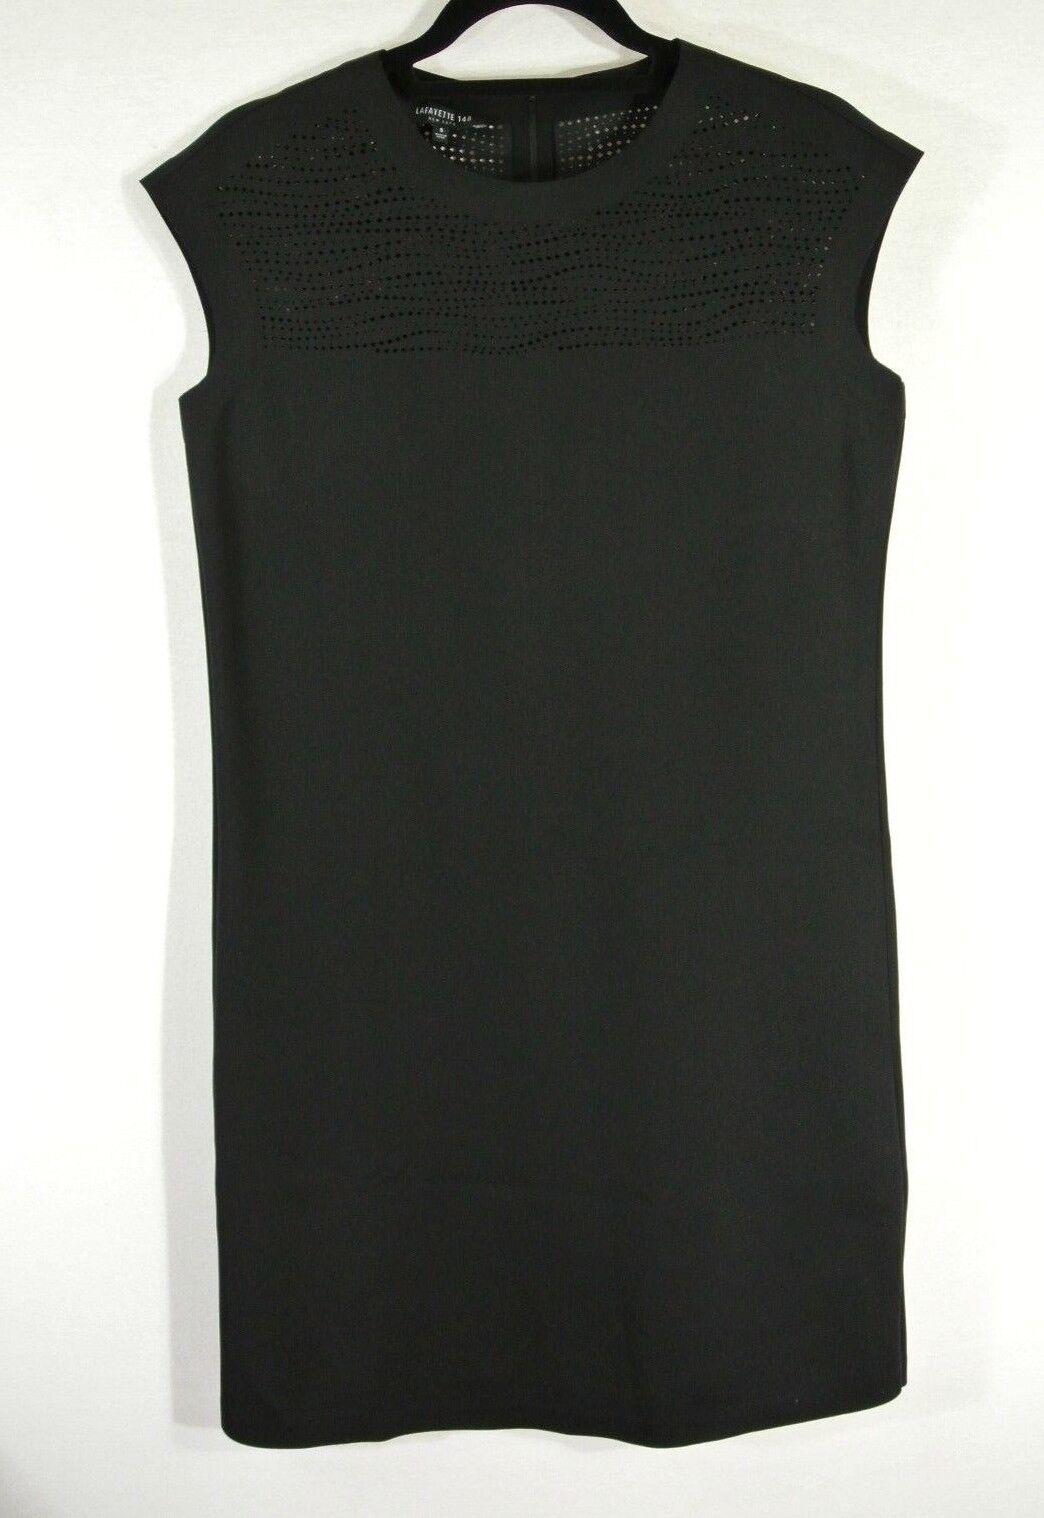 NEW Lafayette 148 schwarz Cap-sleeve Talon Sheath Dress- Größe S